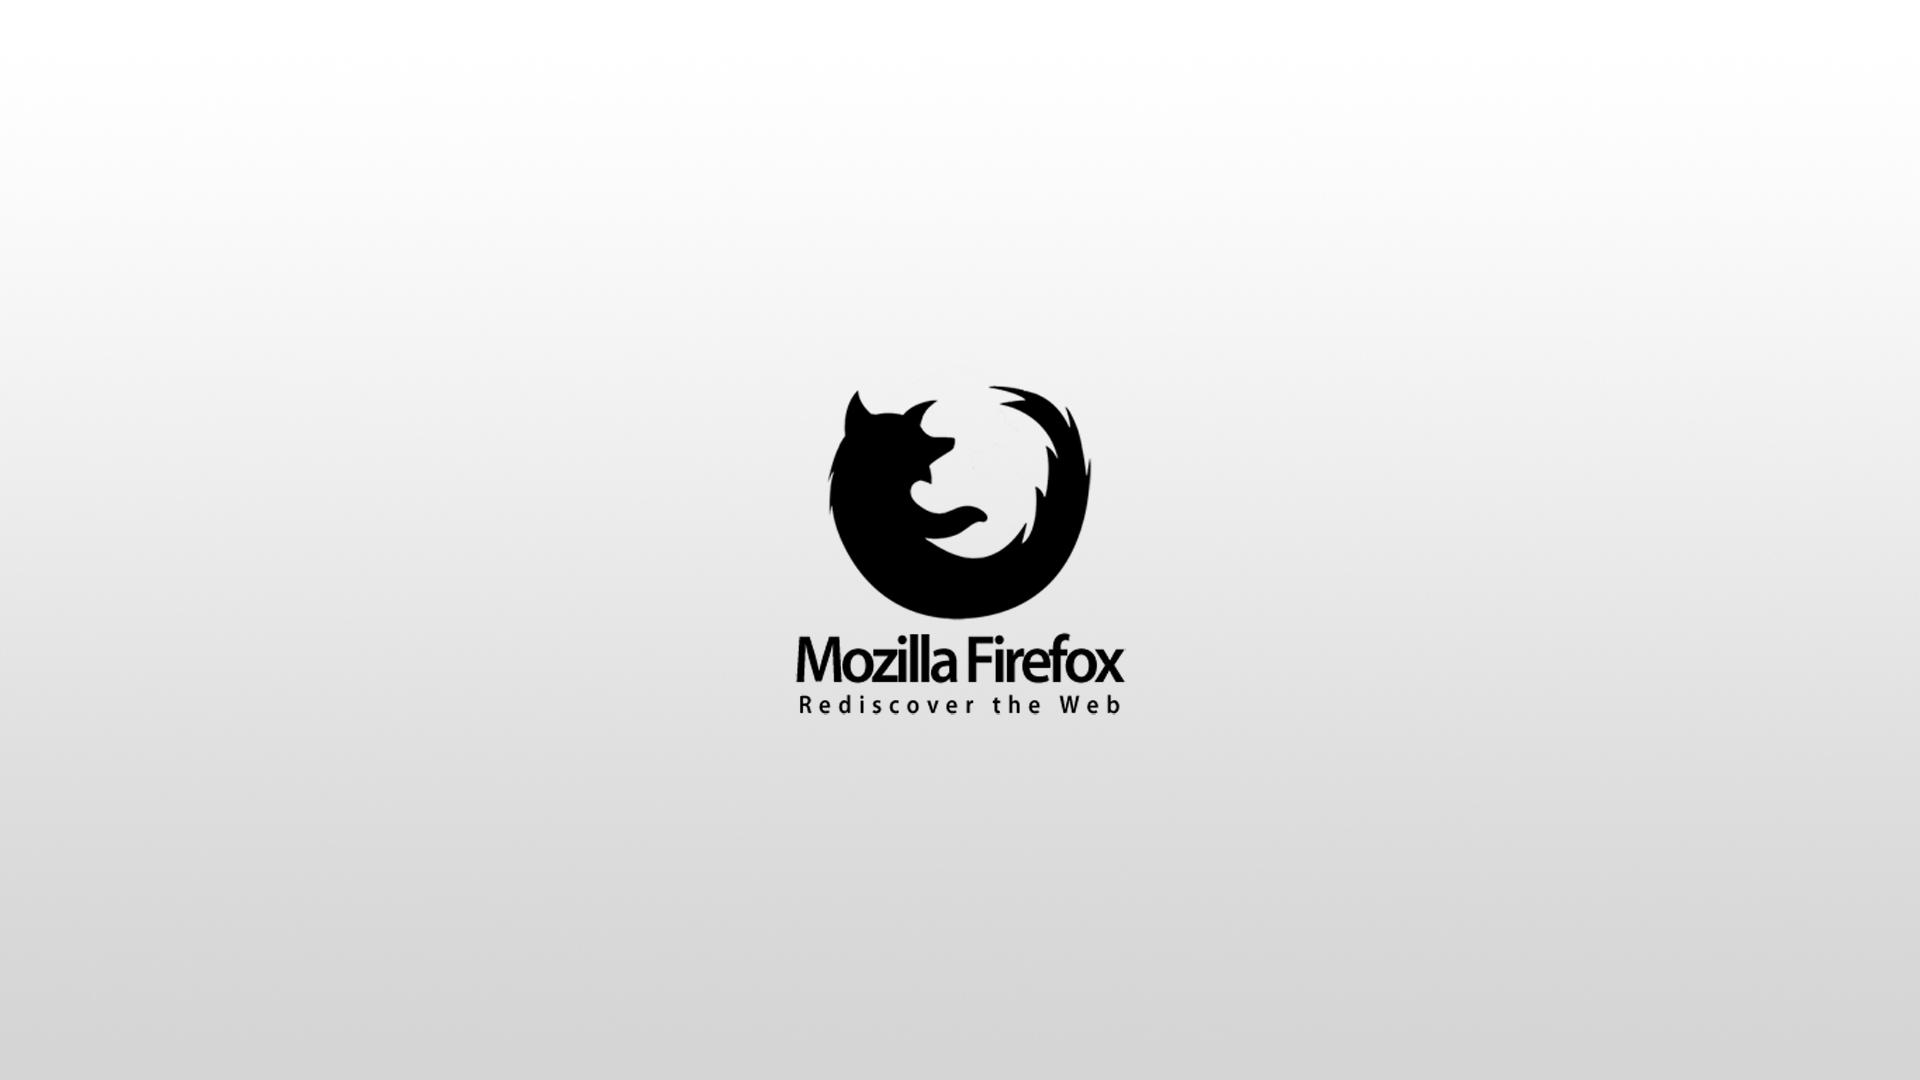 Minimalist Firefox Wallpaper By Cesaraquino